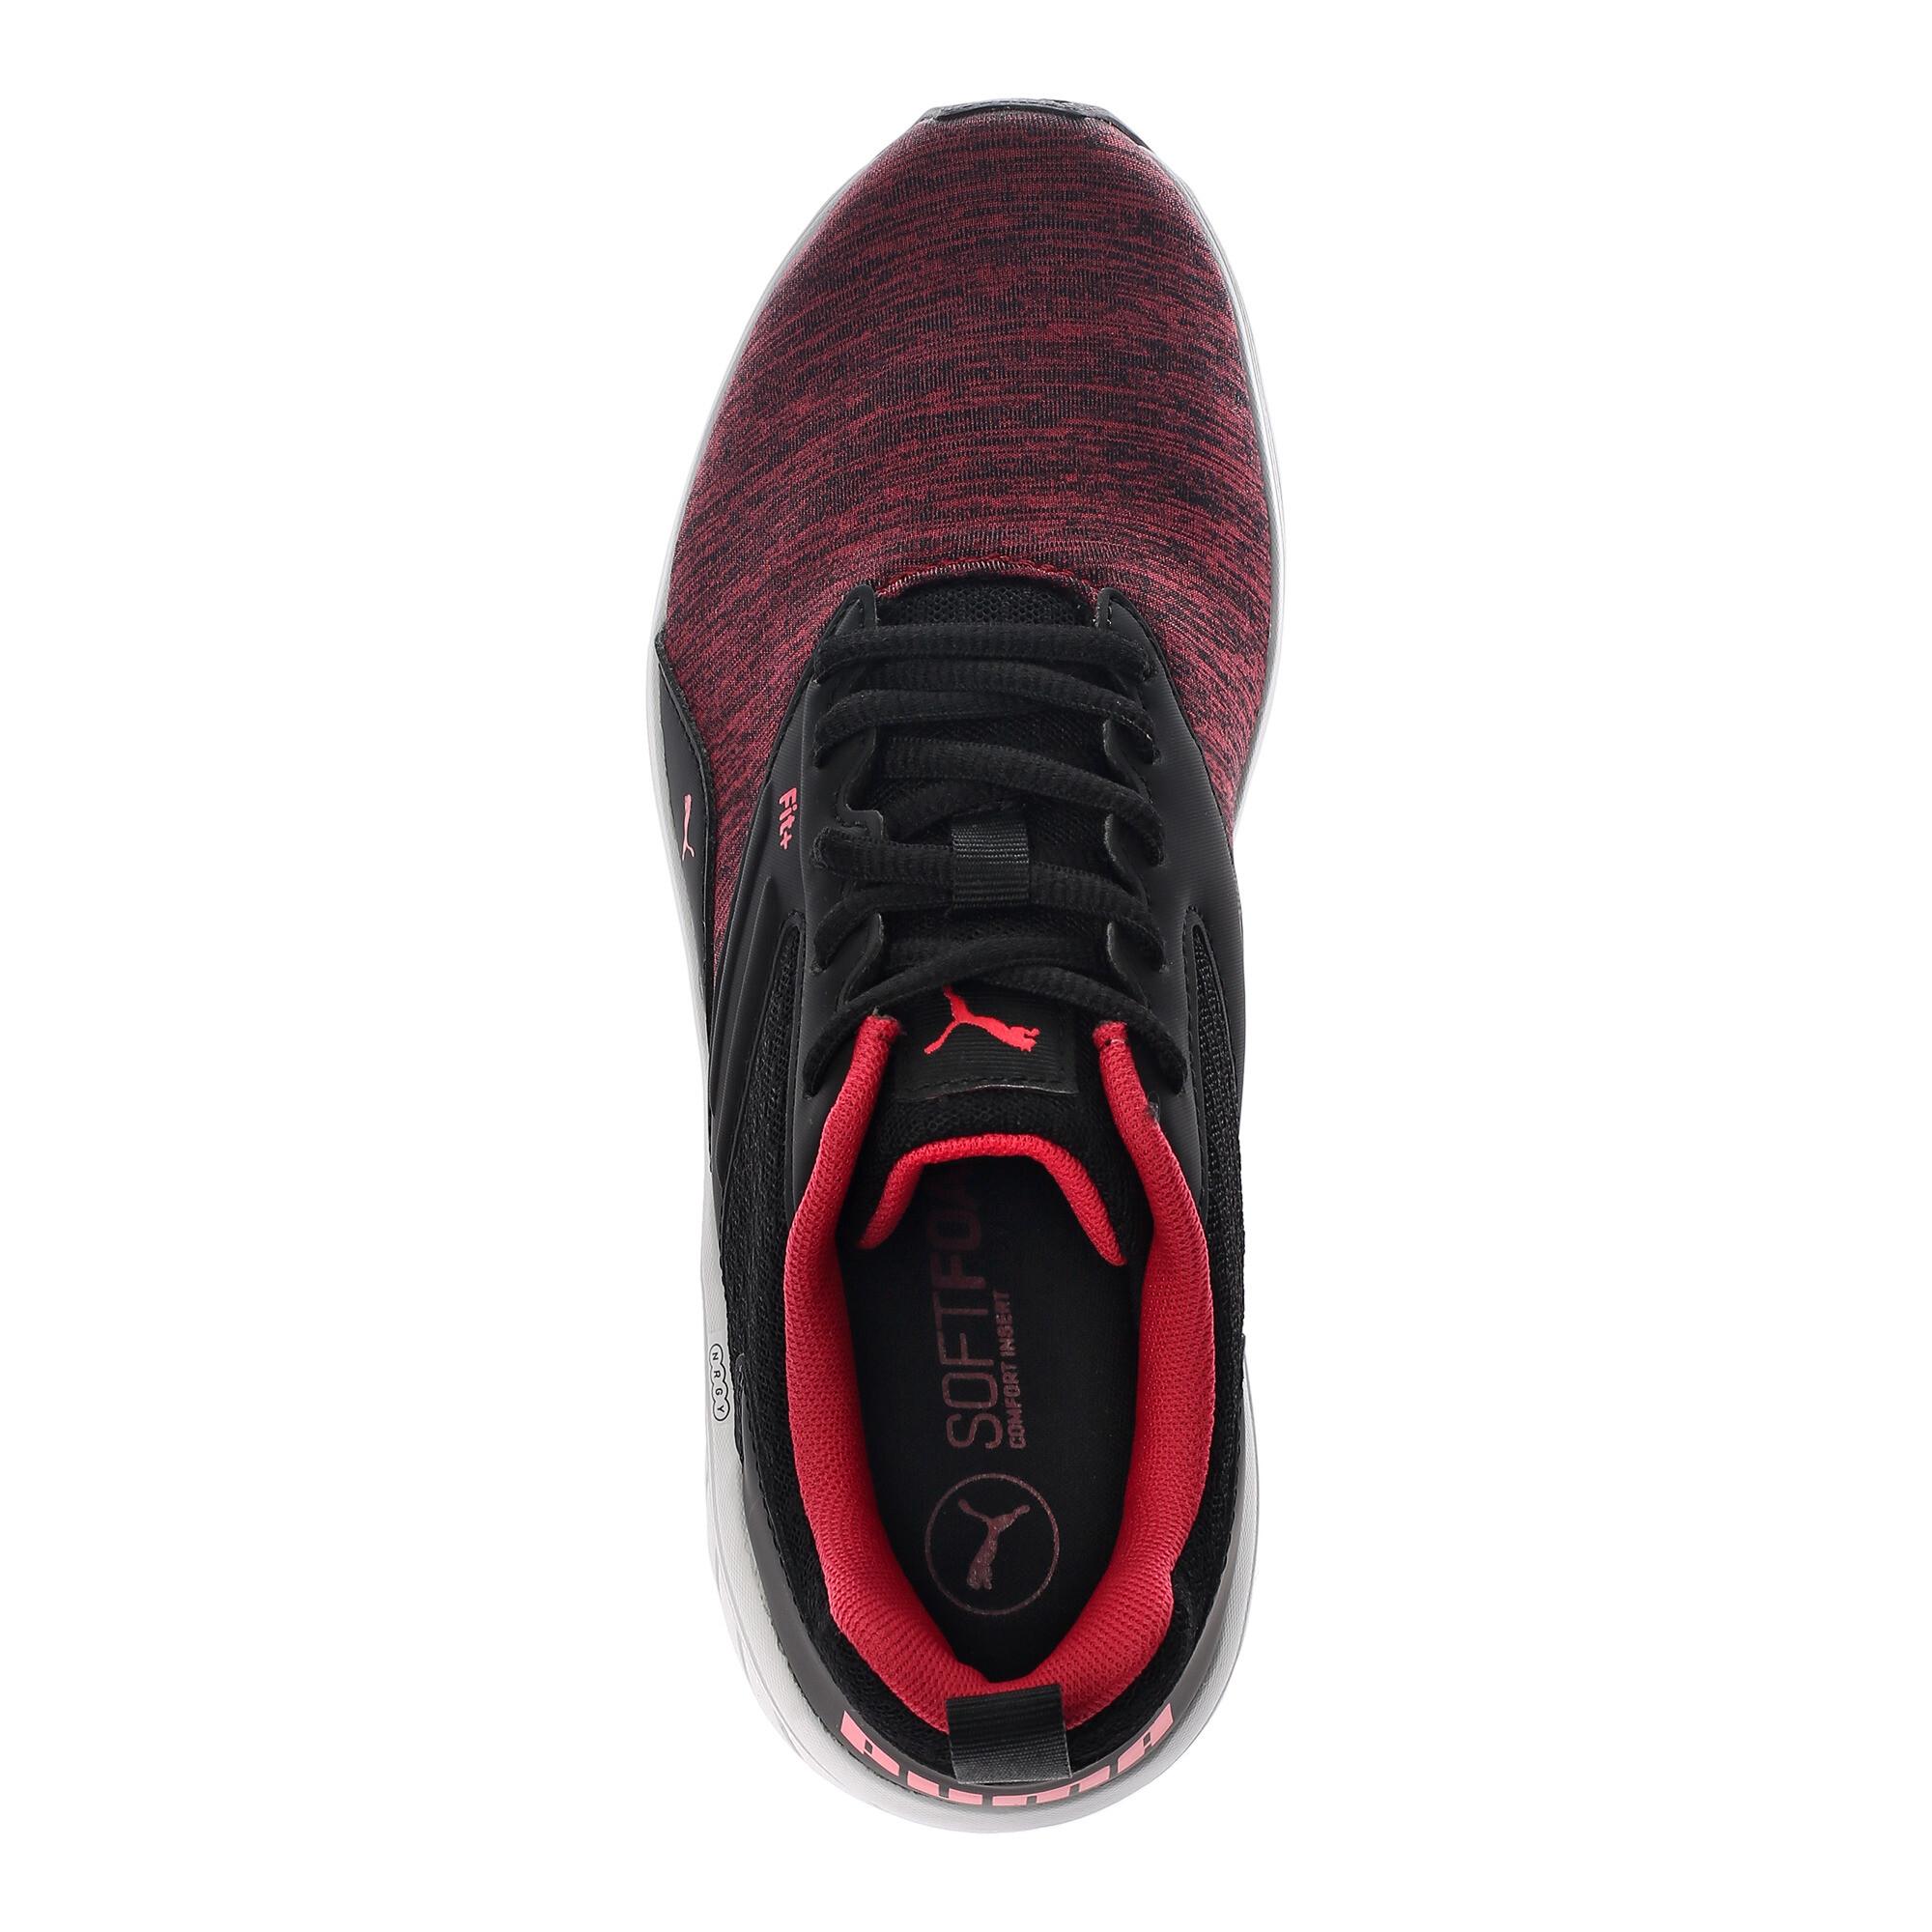 PUMA-NRGY-Comet-Men-039-s-Running-Shoes-Men-Shoe-Running thumbnail 6